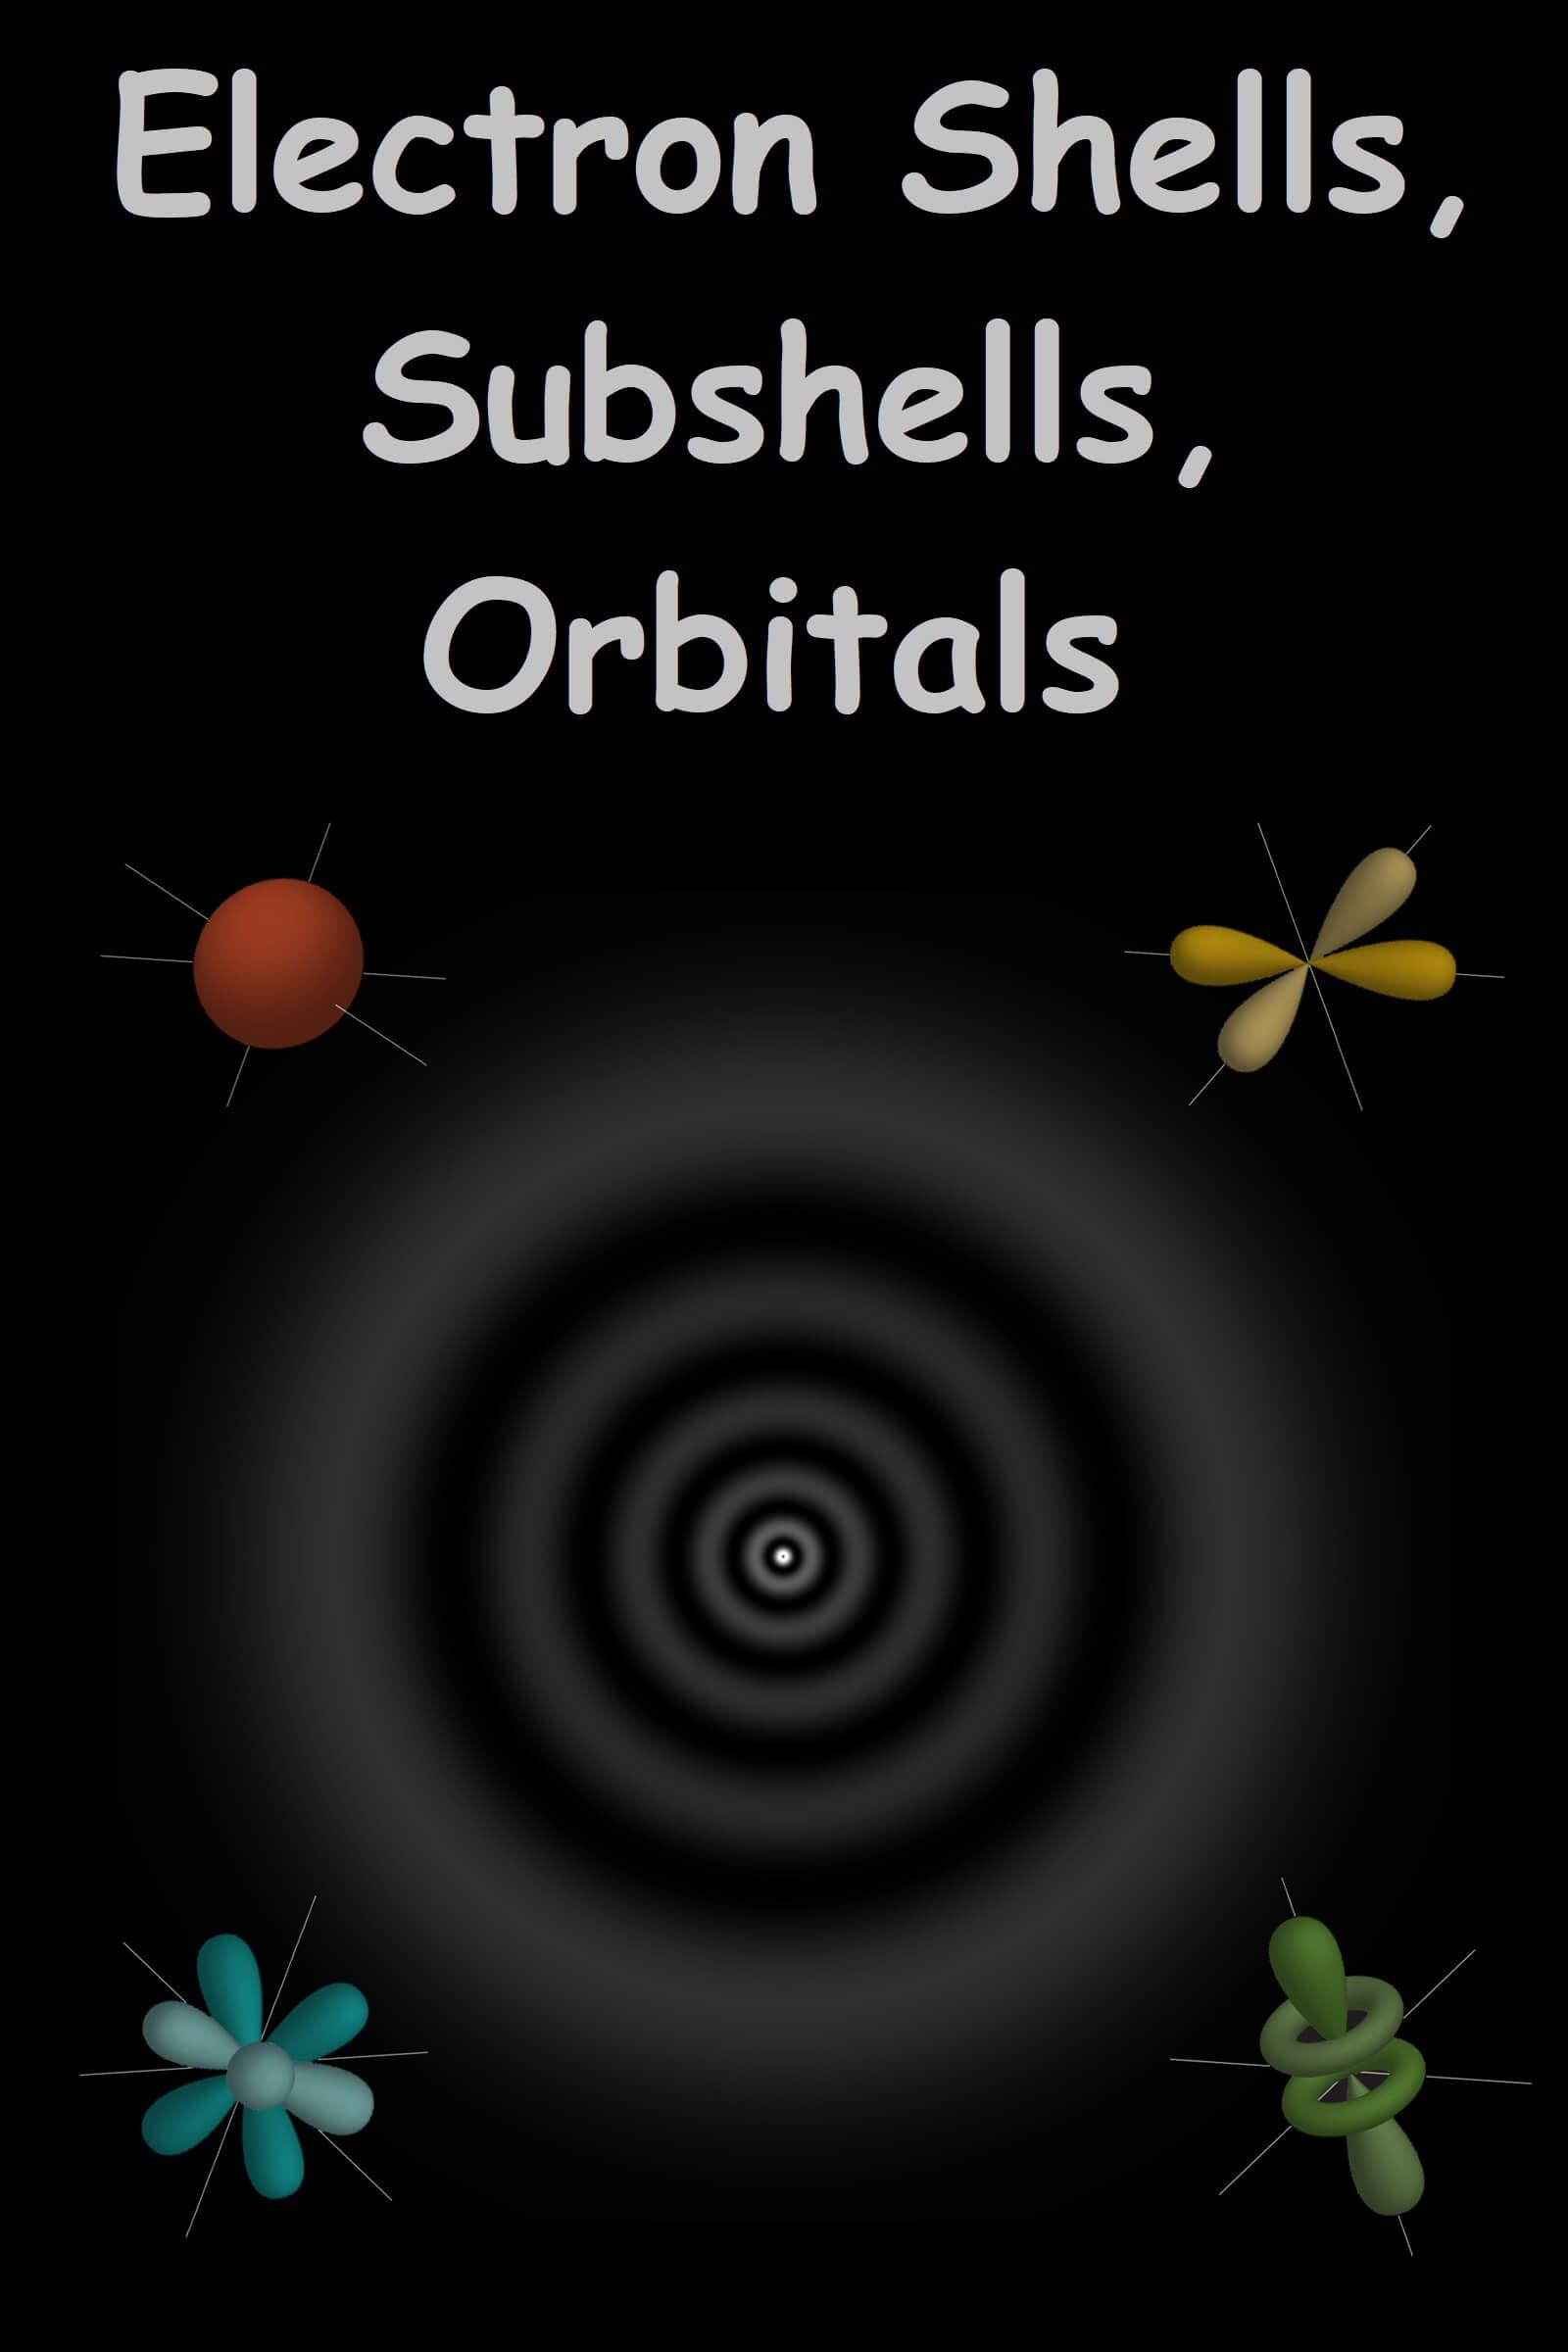 electron shells subshells and orbitals